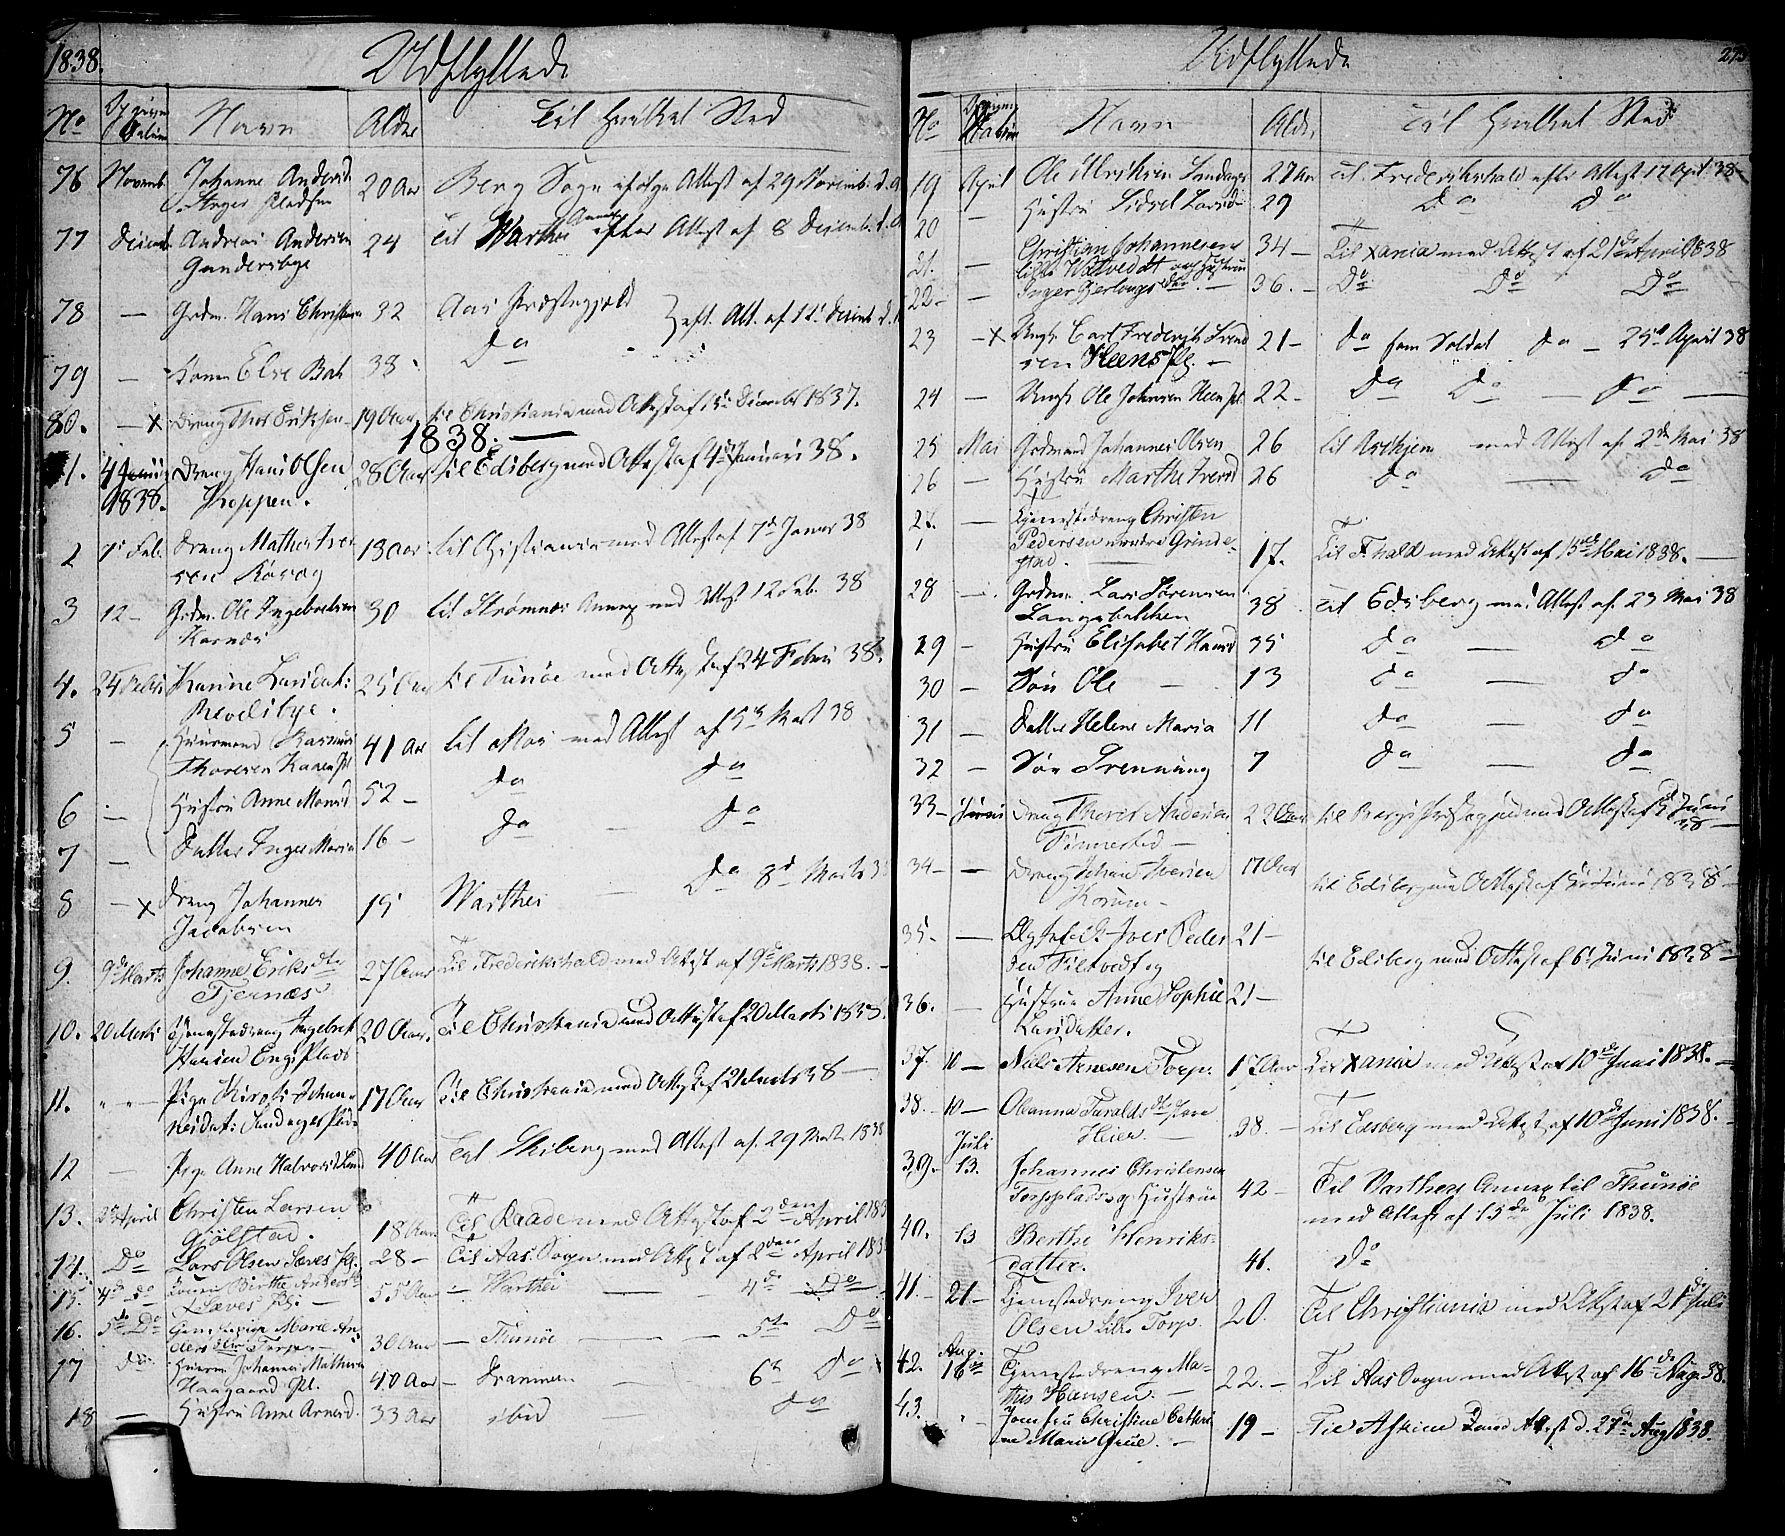 SAO, Rakkestad prestekontor Kirkebøker, F/Fa/L0007: Ministerialbok nr. I 7, 1825-1841, s. 273